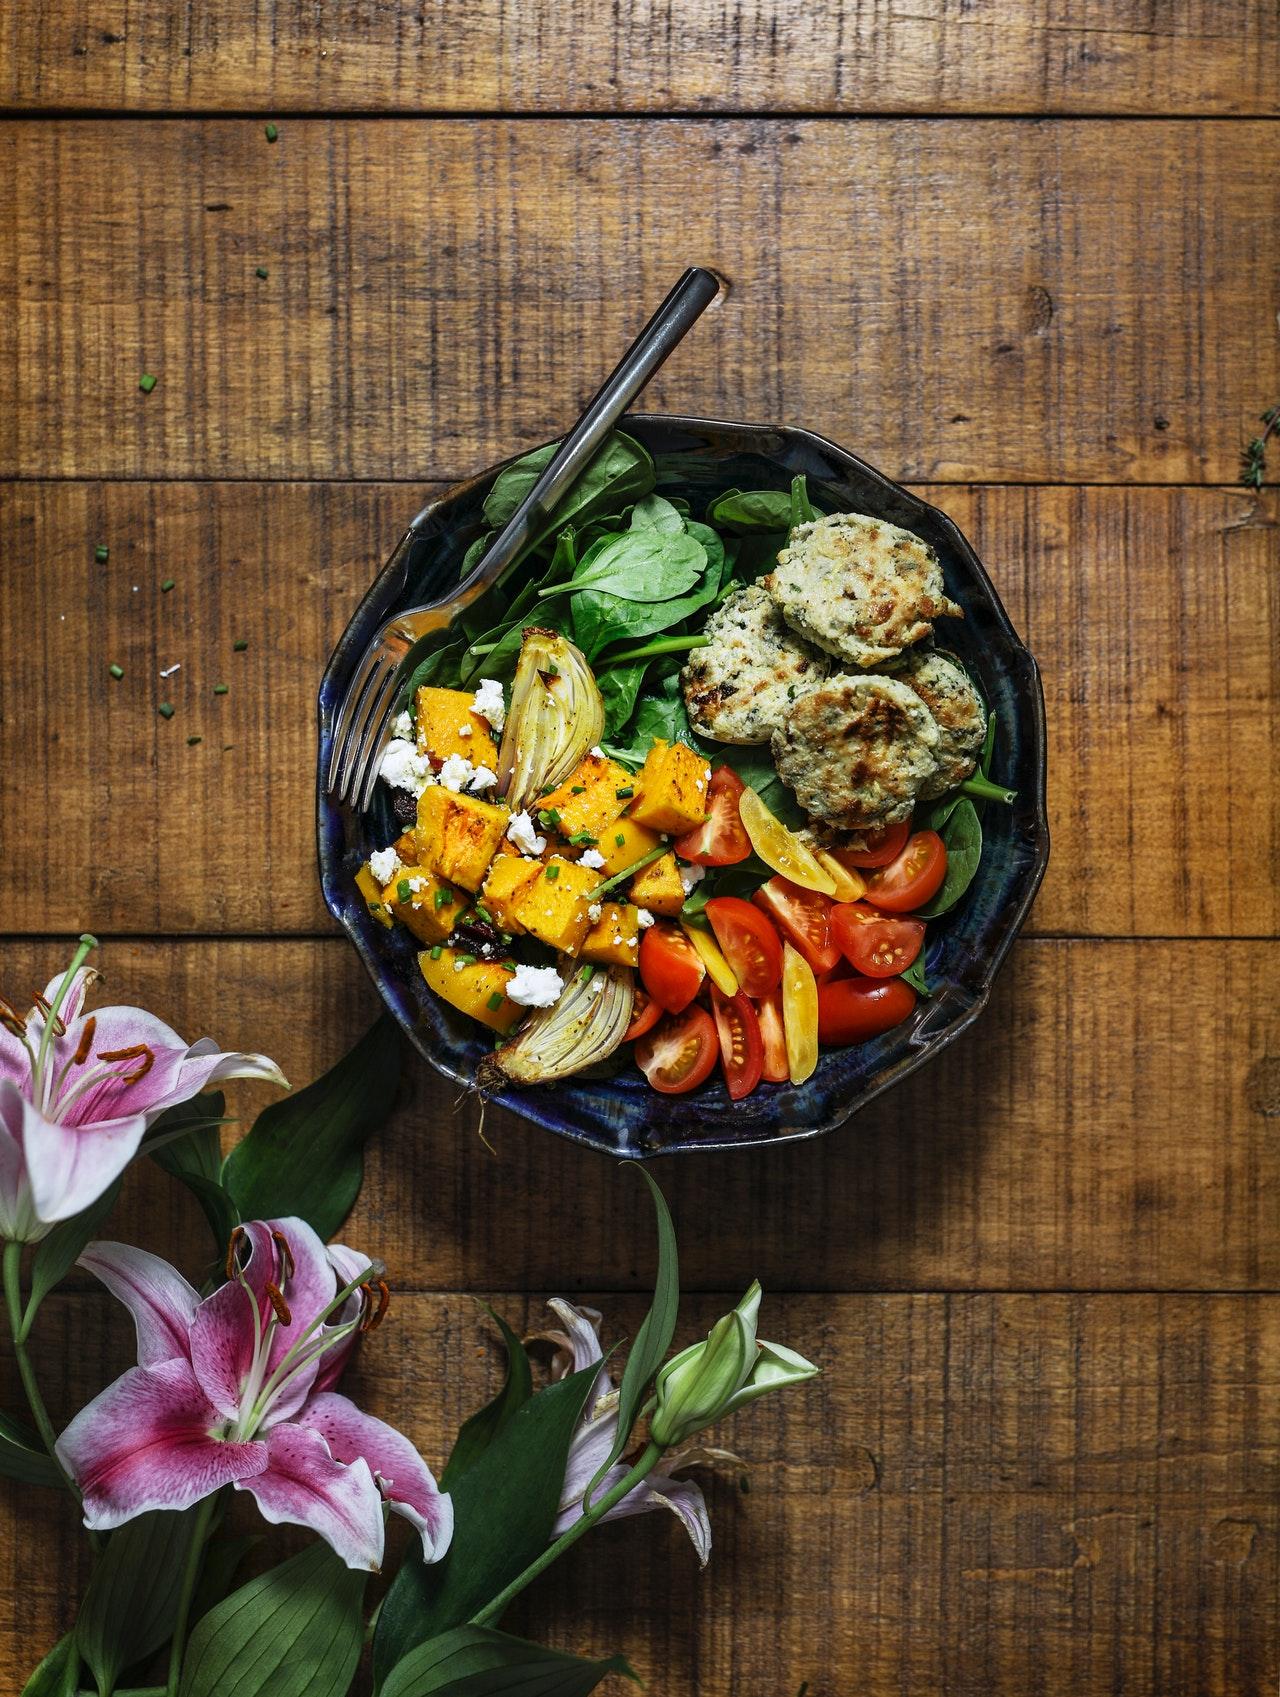 vegan-protein-sources